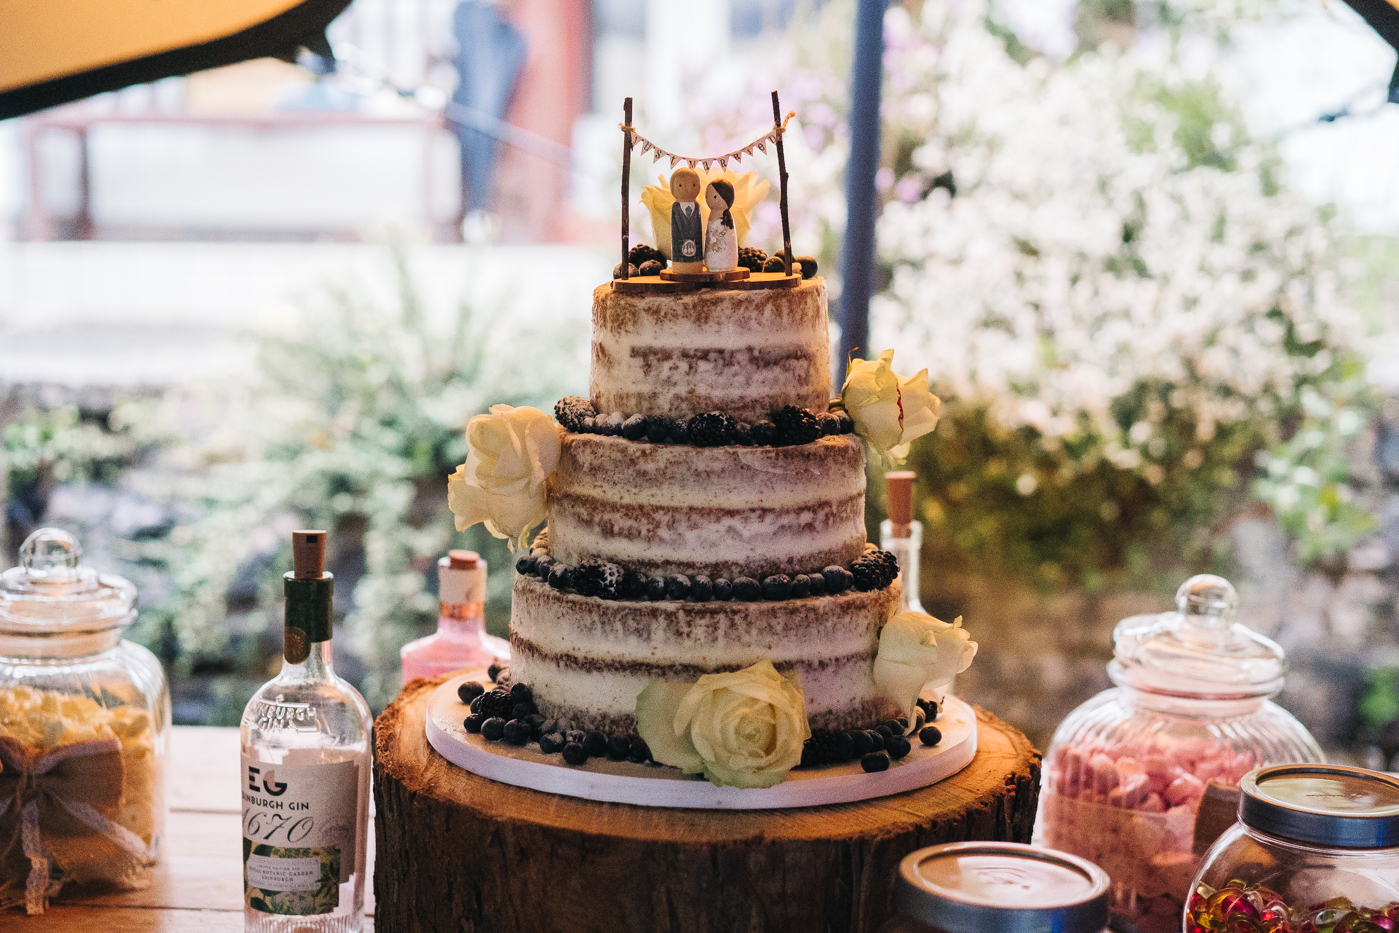 scottish-wedding-trossachs-loch-tay-highlannds-relaxed-photography-photographer-0047.jpg